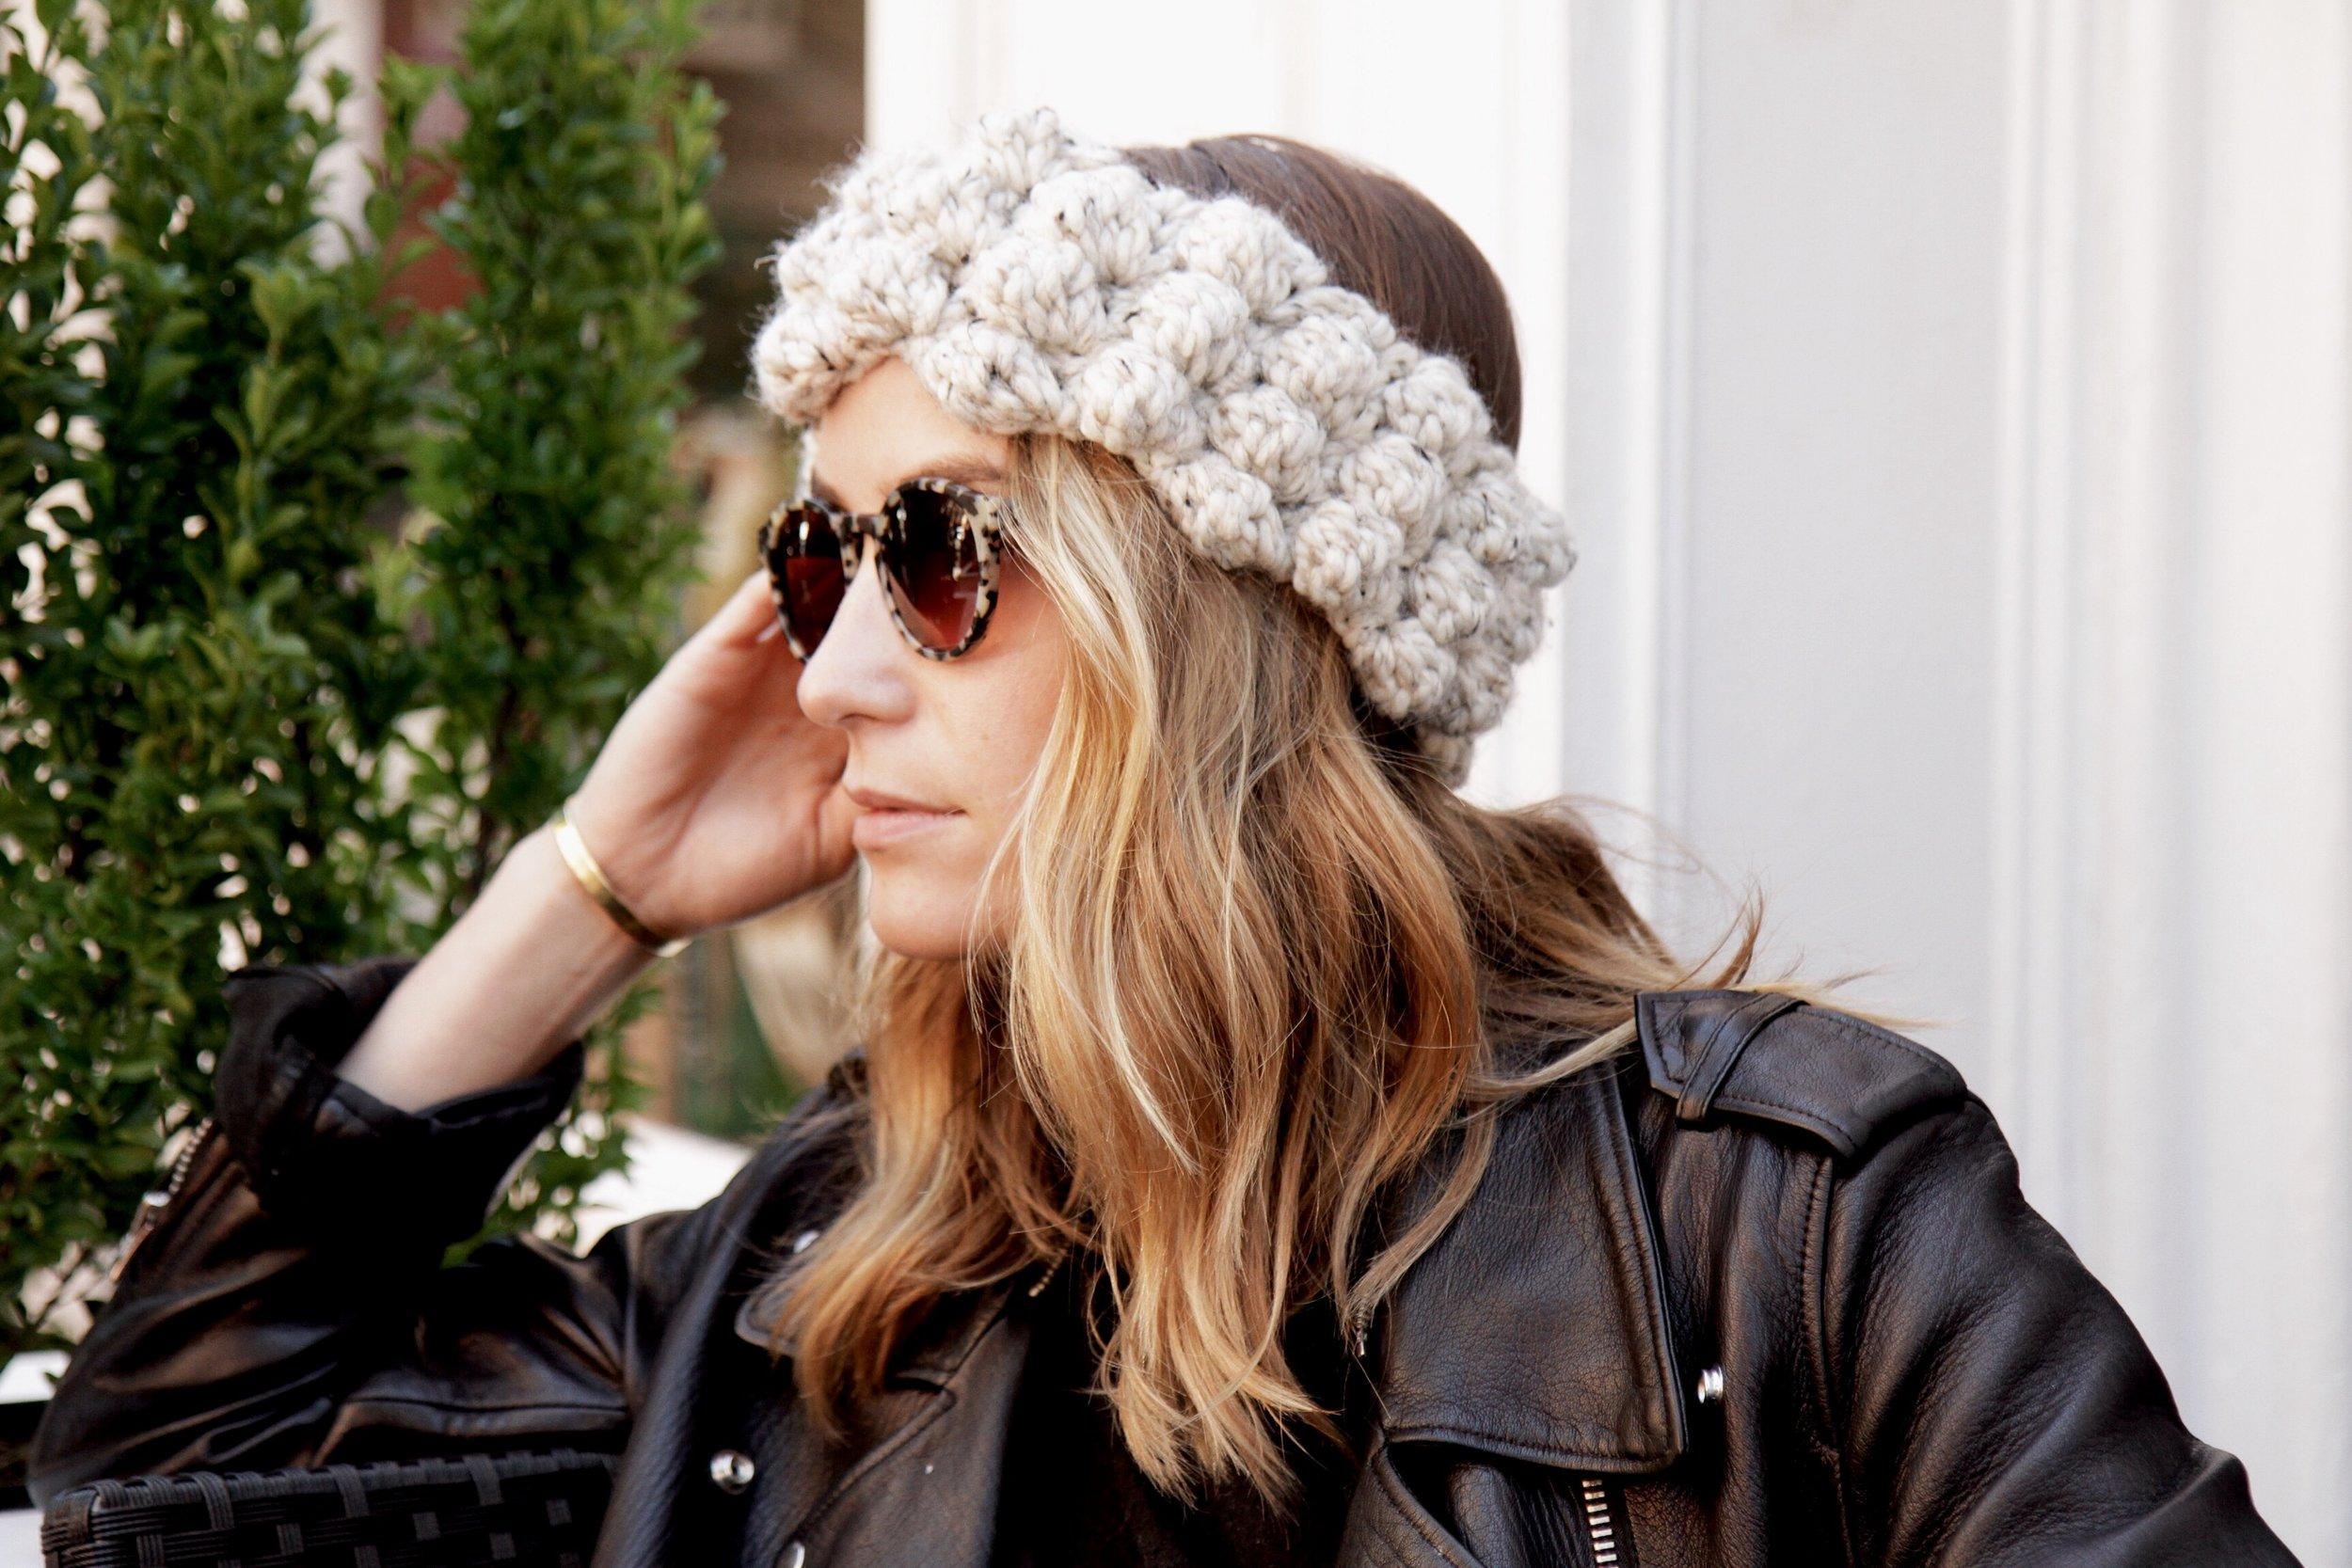 Bobble Crown Headband Main Photo.jpg